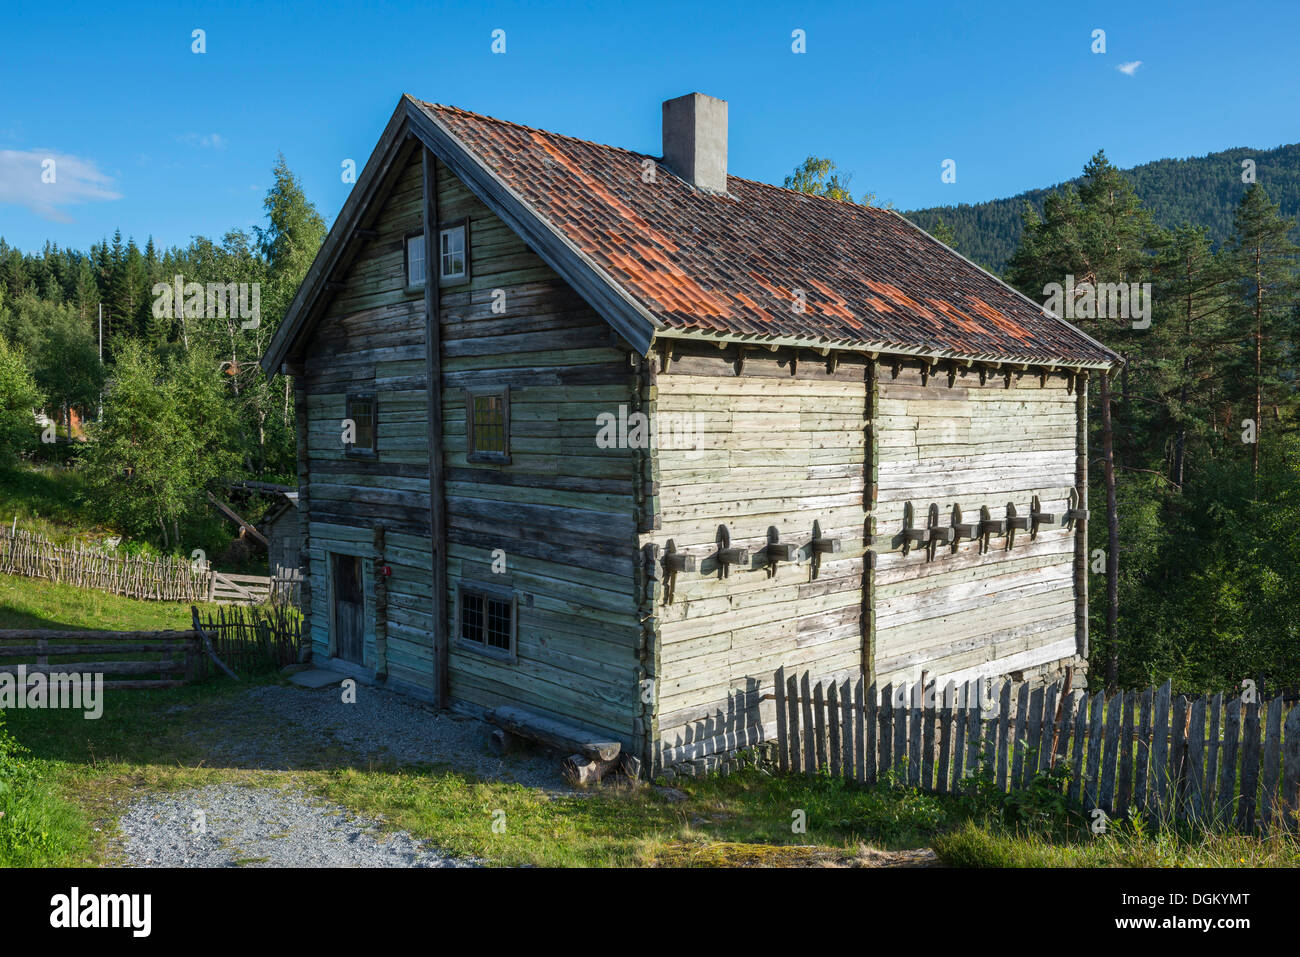 Leirmohaus, 1793, Sogn Folk Museum, open-air museum, Kaupanger, Sogndal, Sogn og Fjordane, Western Norway, Norway - Stock Image